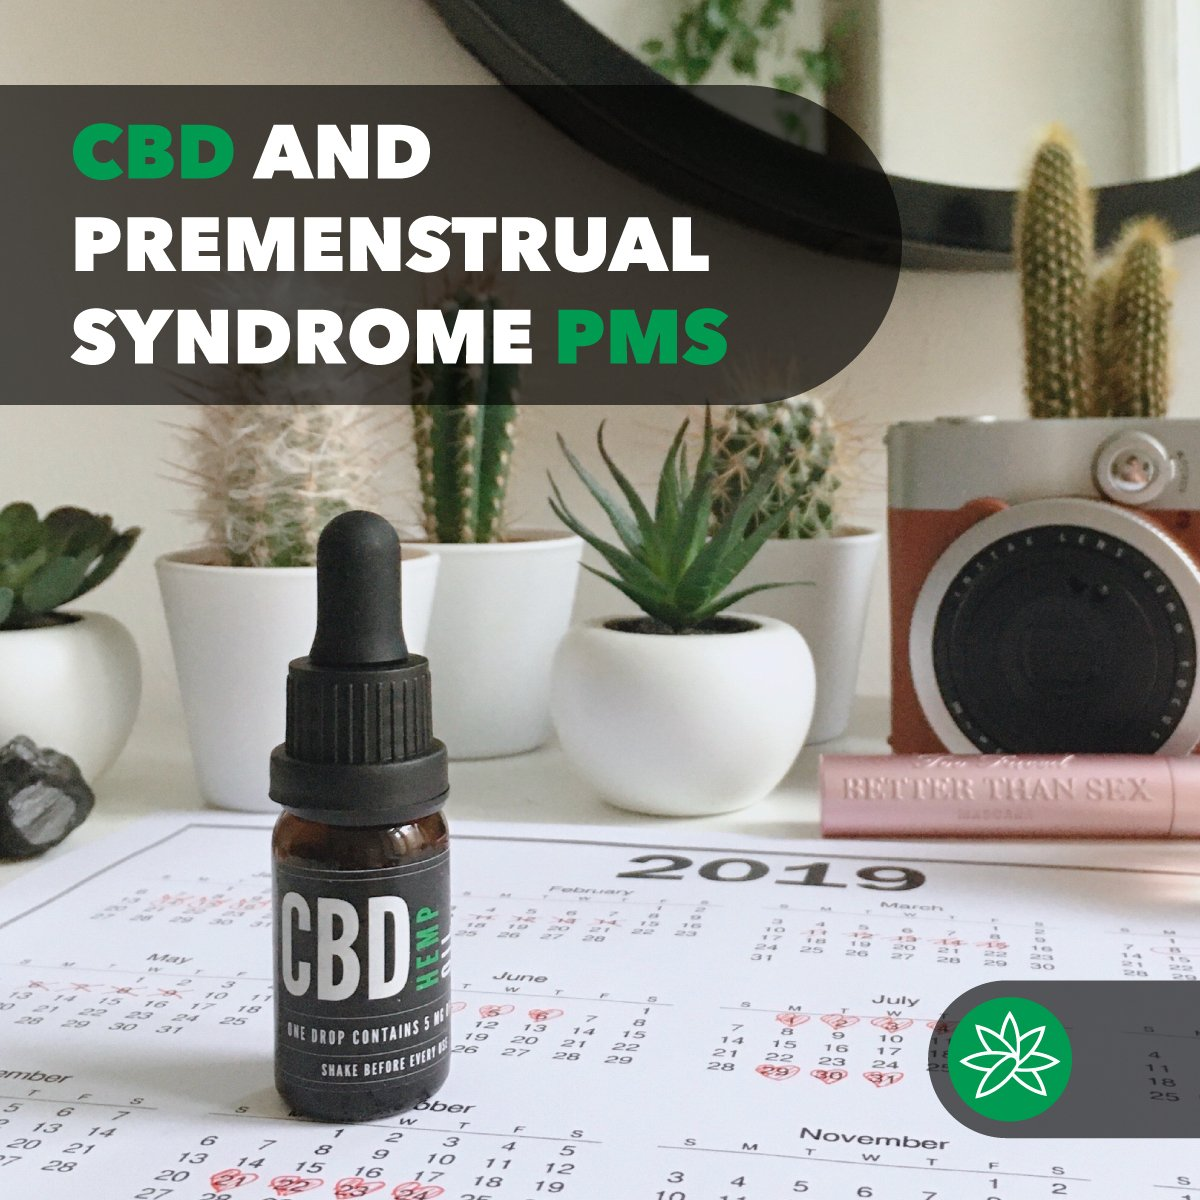 CBD and premenstrual syndrome PMS